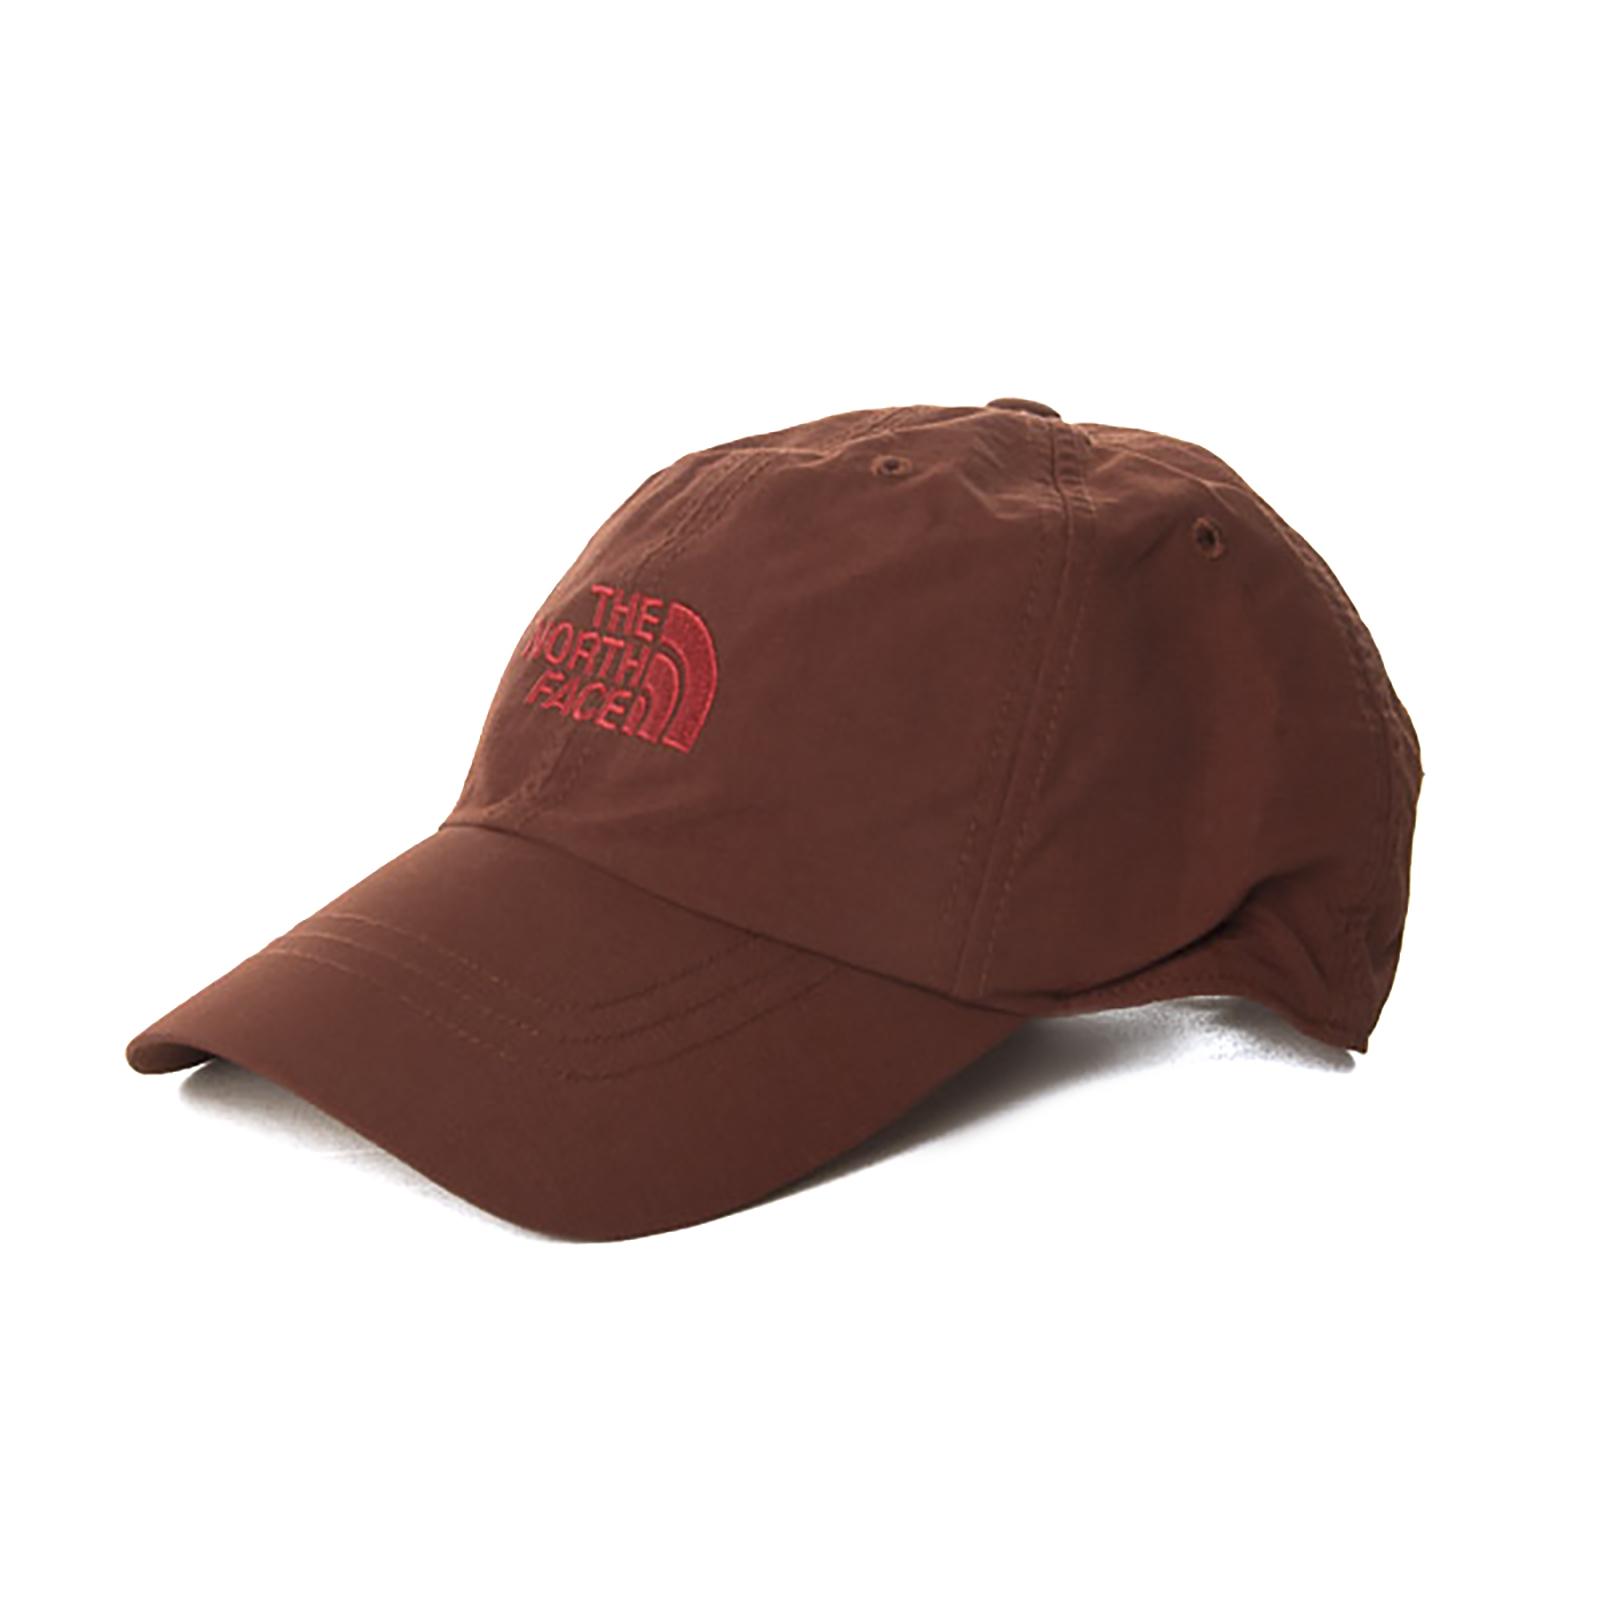 THE NORTH FACE Cappelli   Hats Uomo Horizon Hat Sequoia Red - EUR 12 ... 6620ff5ac1c7